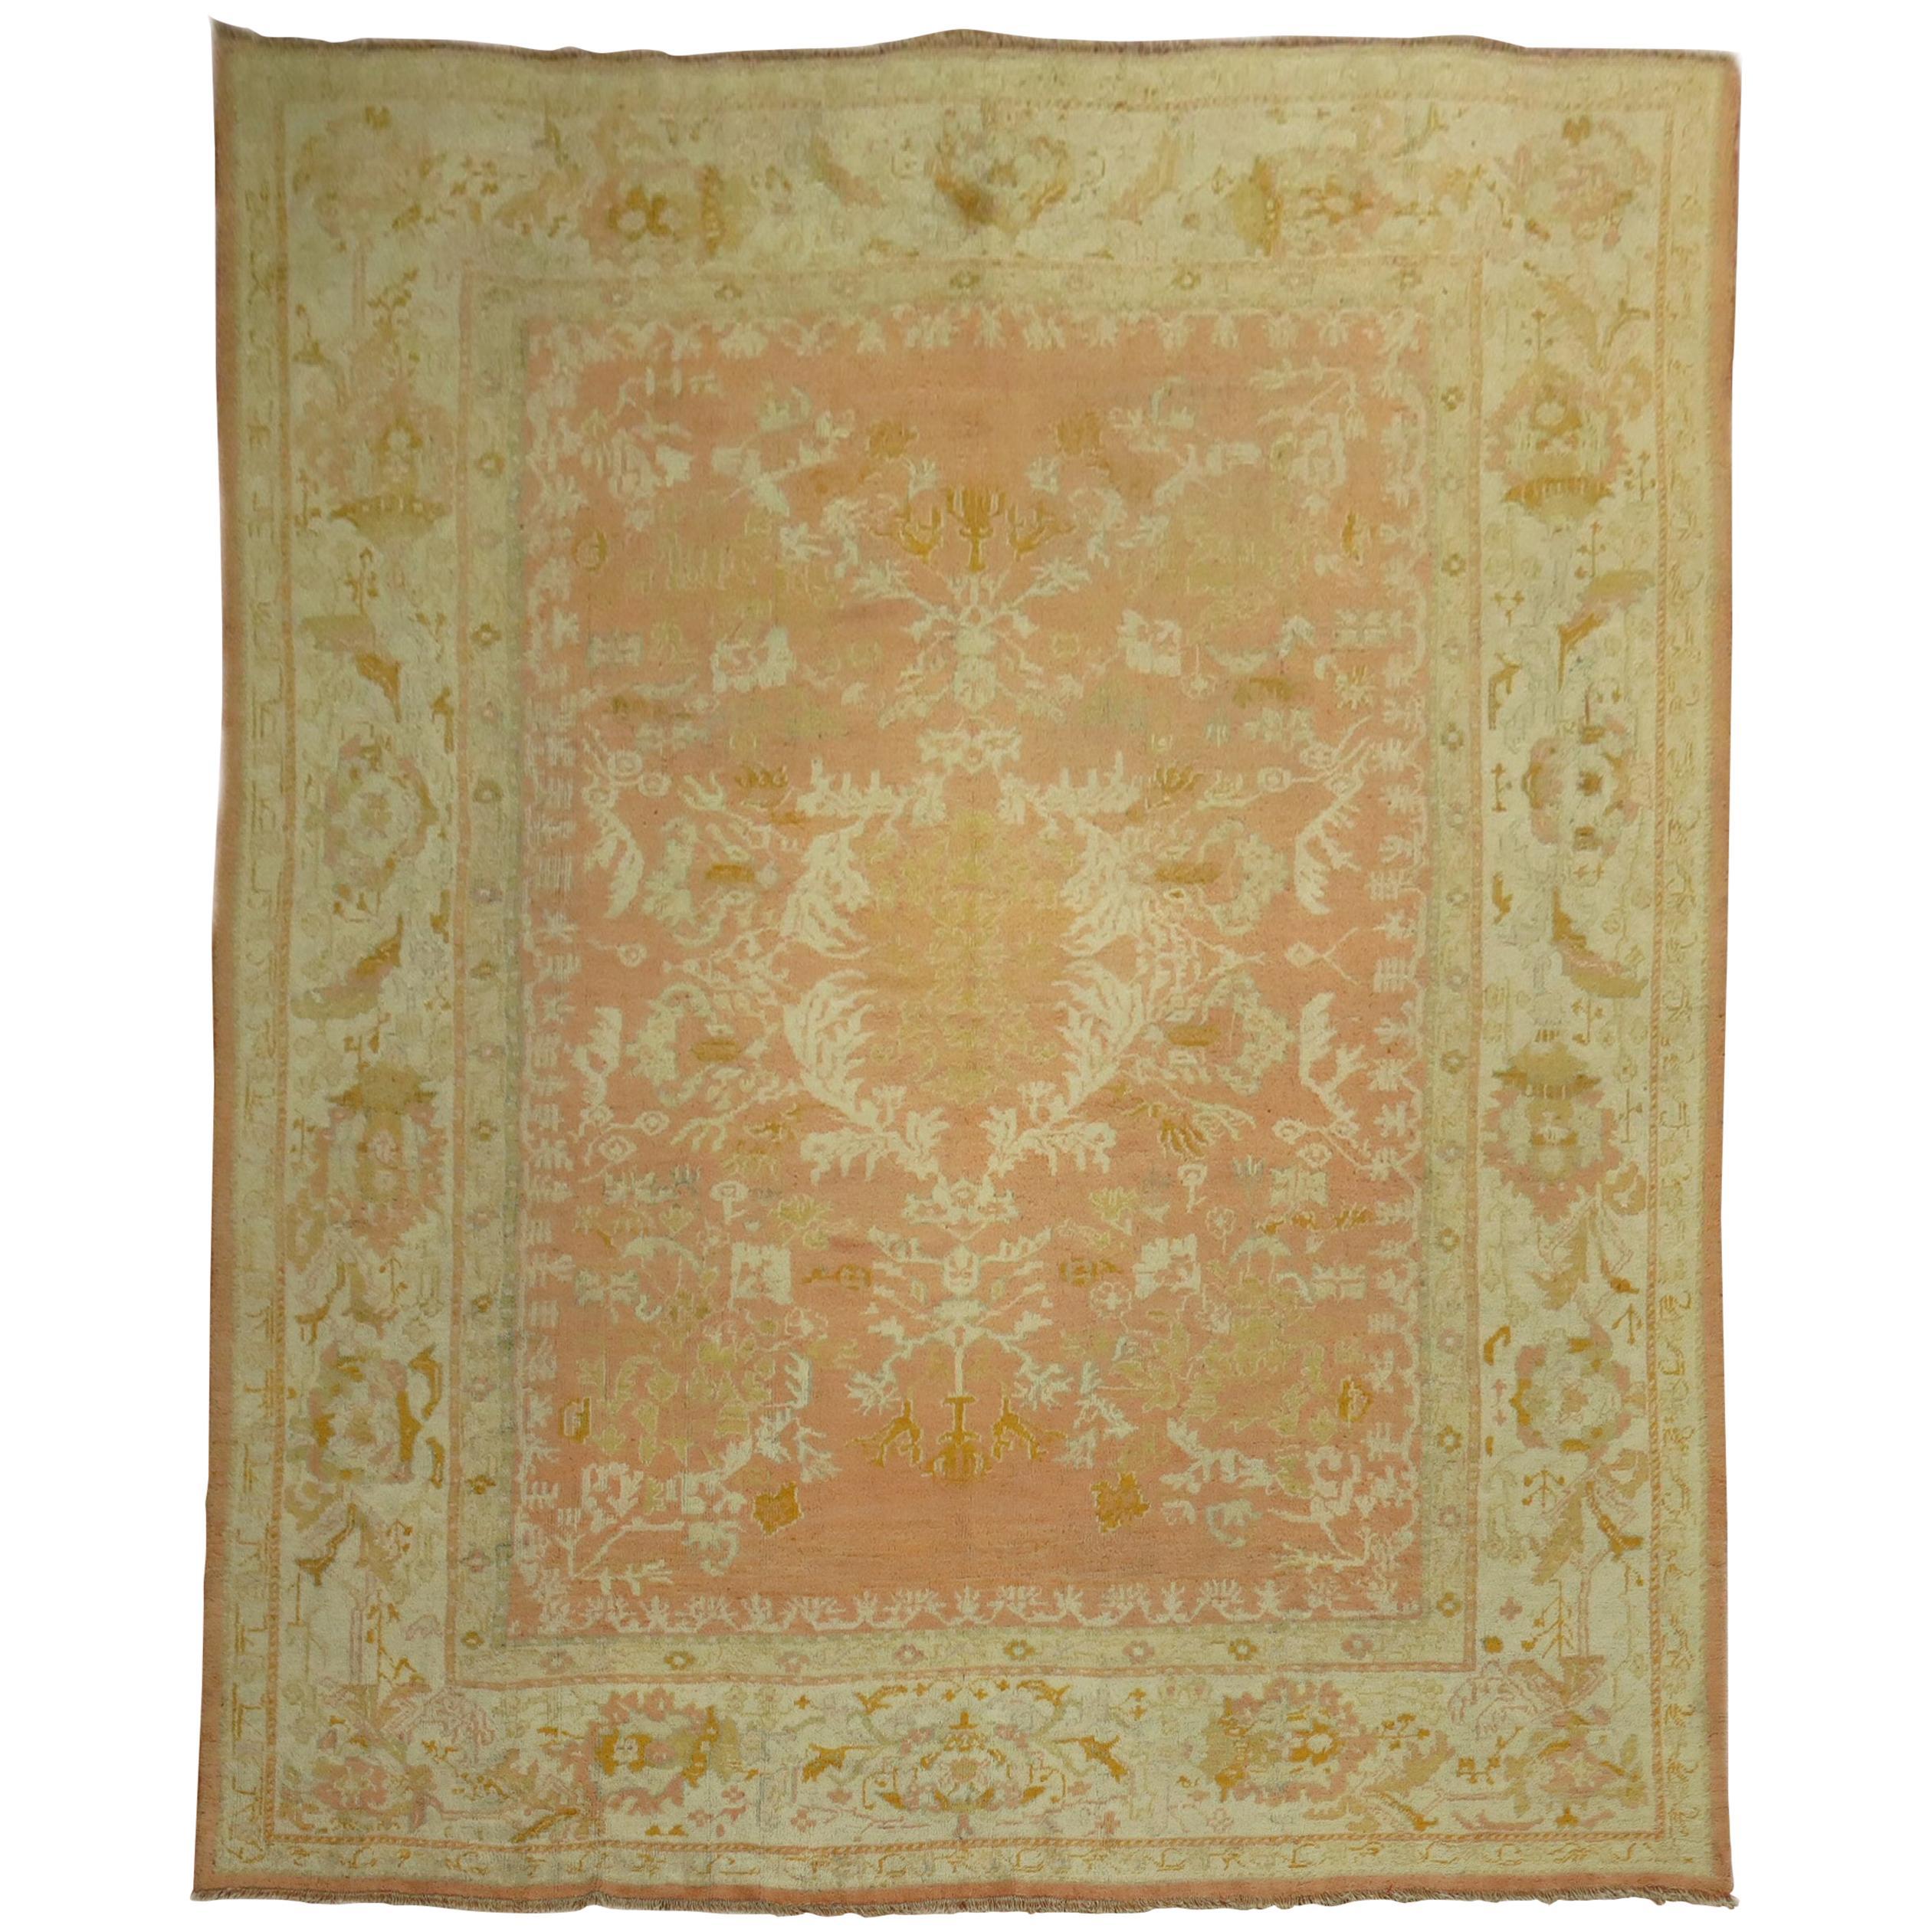 Peach Antique Turkish Oushak Carpet